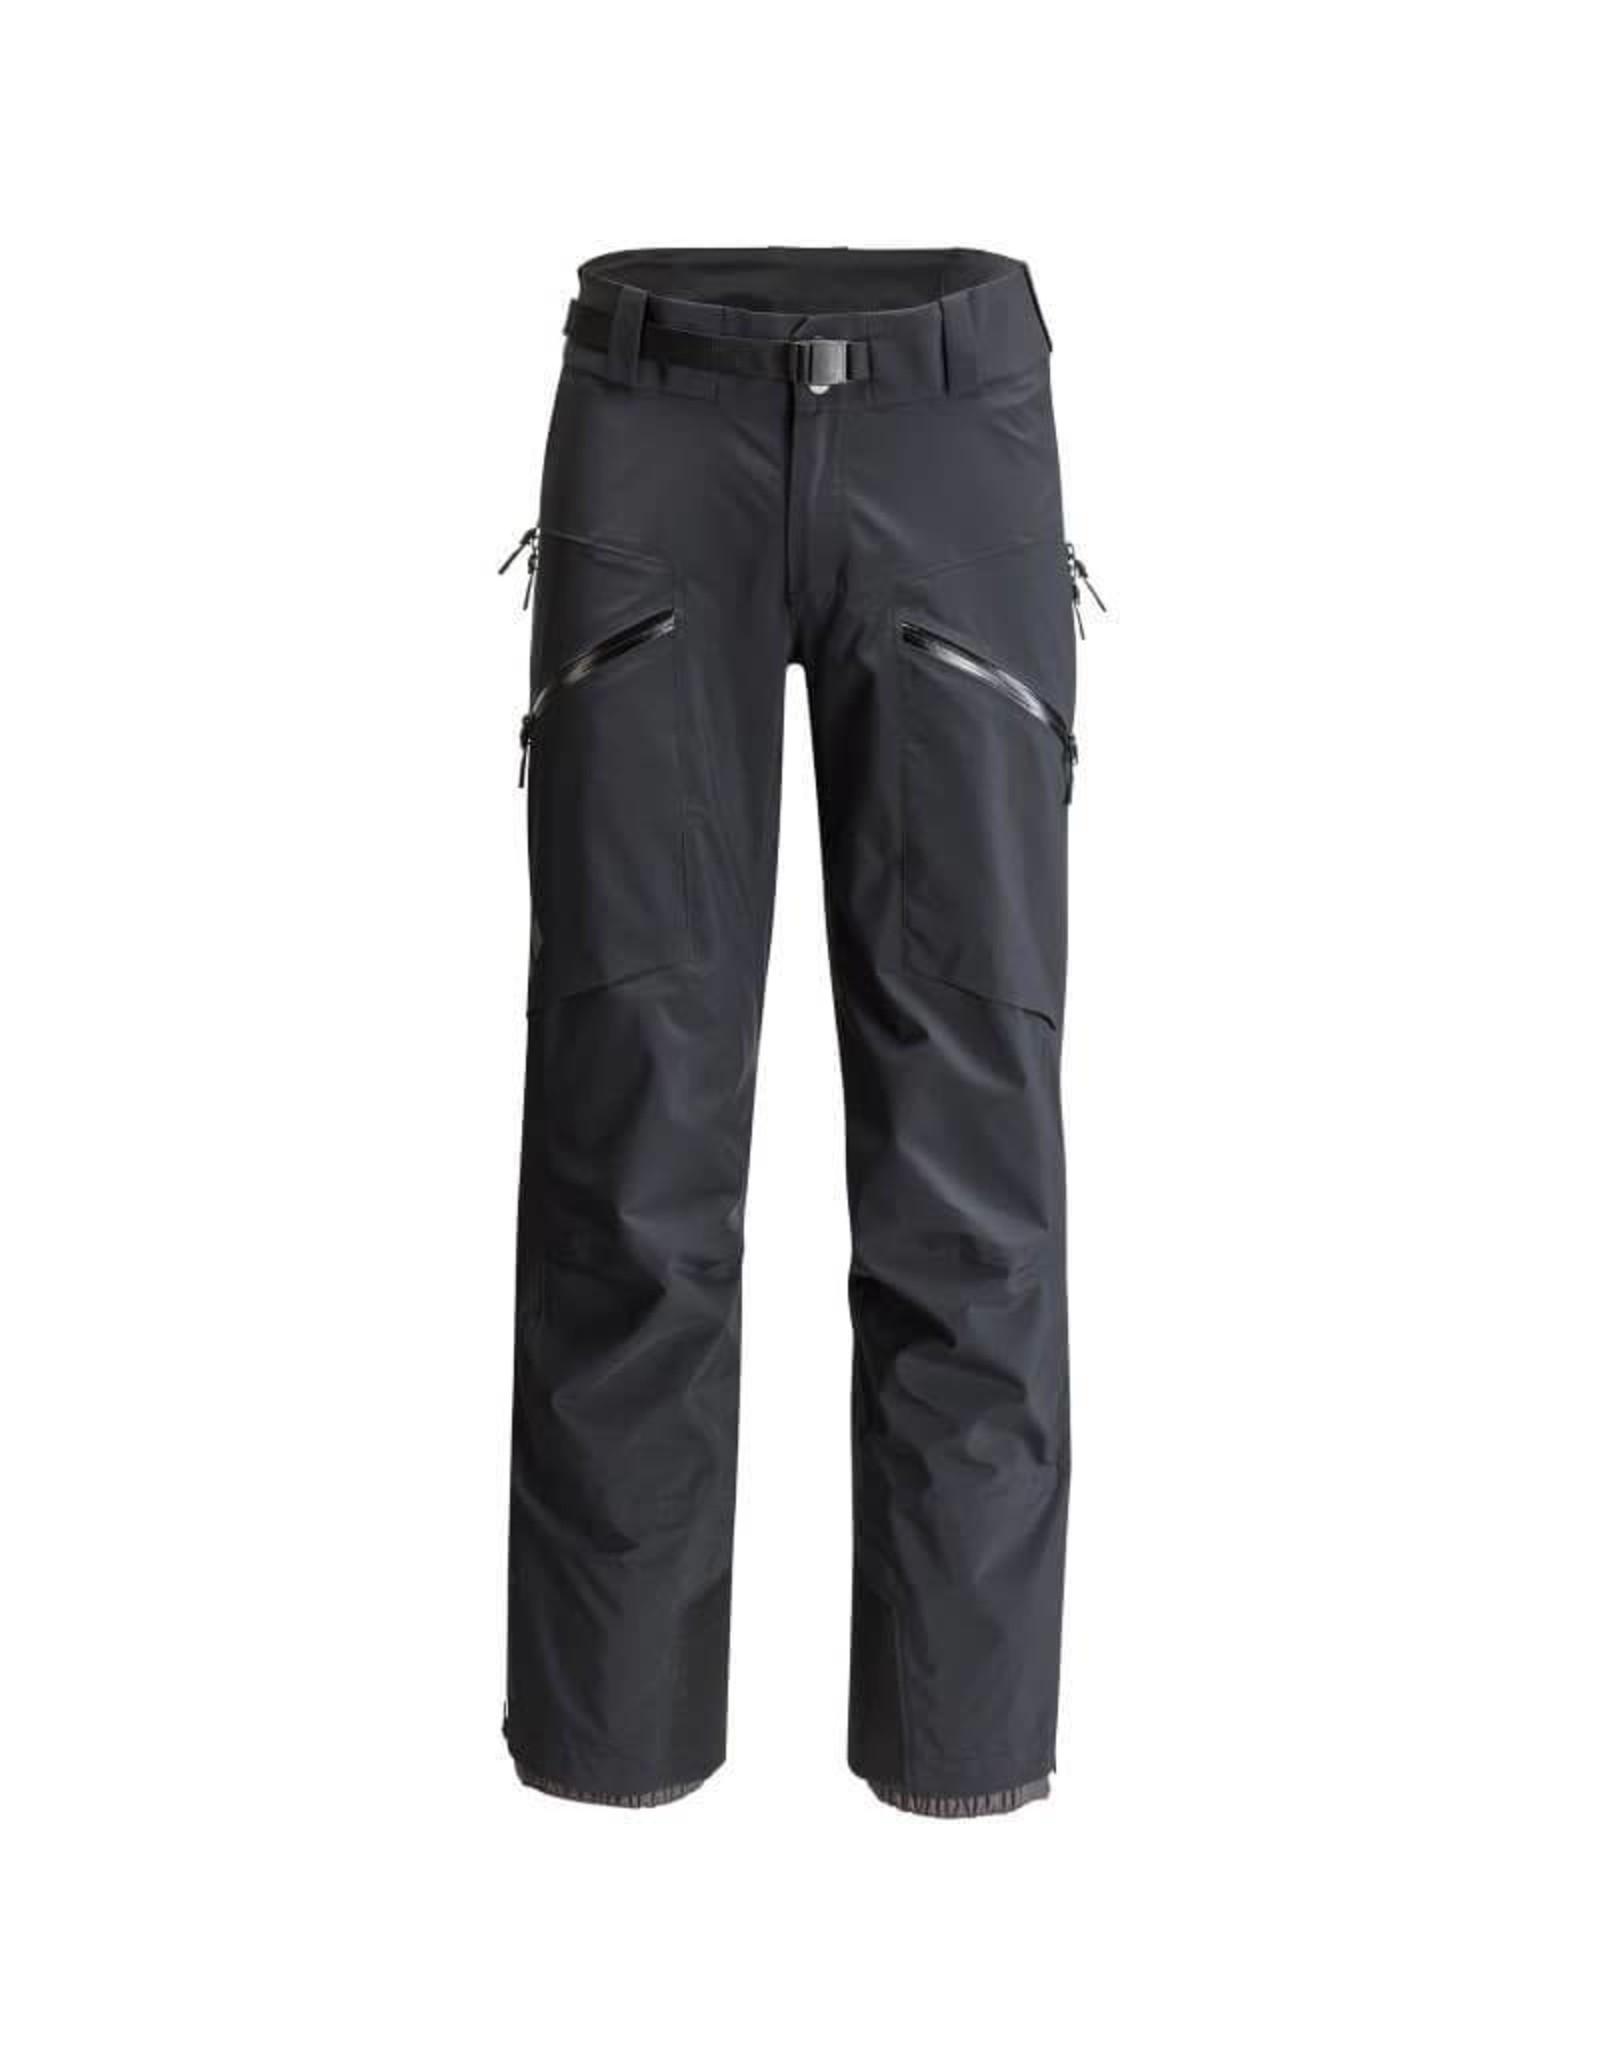 Black Diamond Black Diamond Sharp End Pants